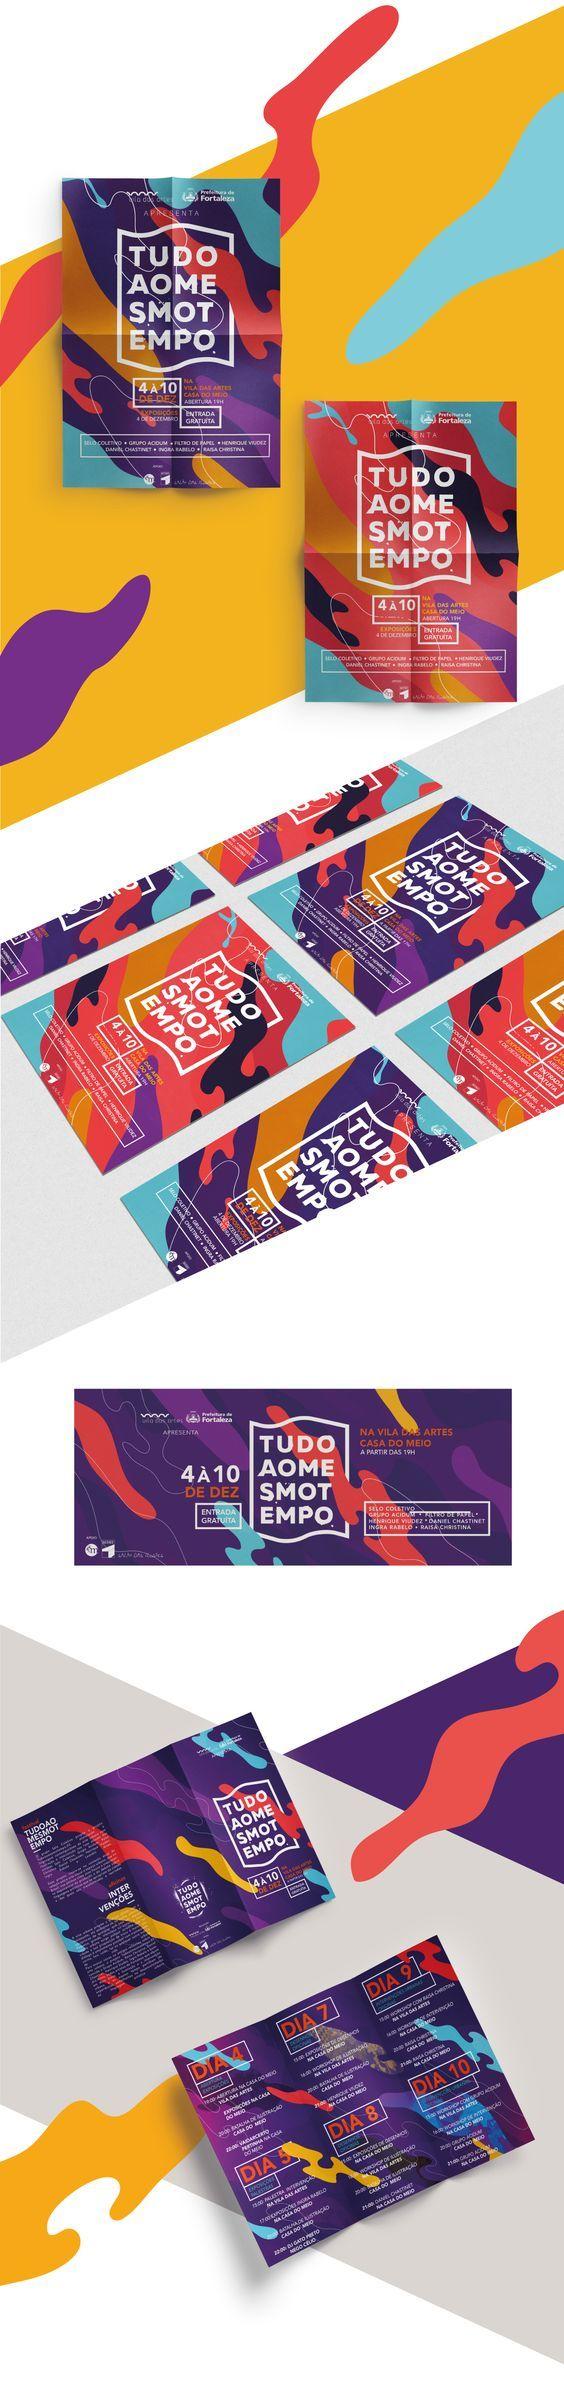 376 Best Brand Images On Pinterest Corporate Identity Raisa Font College Navy M O Grupo Selo Coletivo Prope Projeto Tudoaomesmotempo Misturando A Linguagem Contempornea Da Arte Urbana